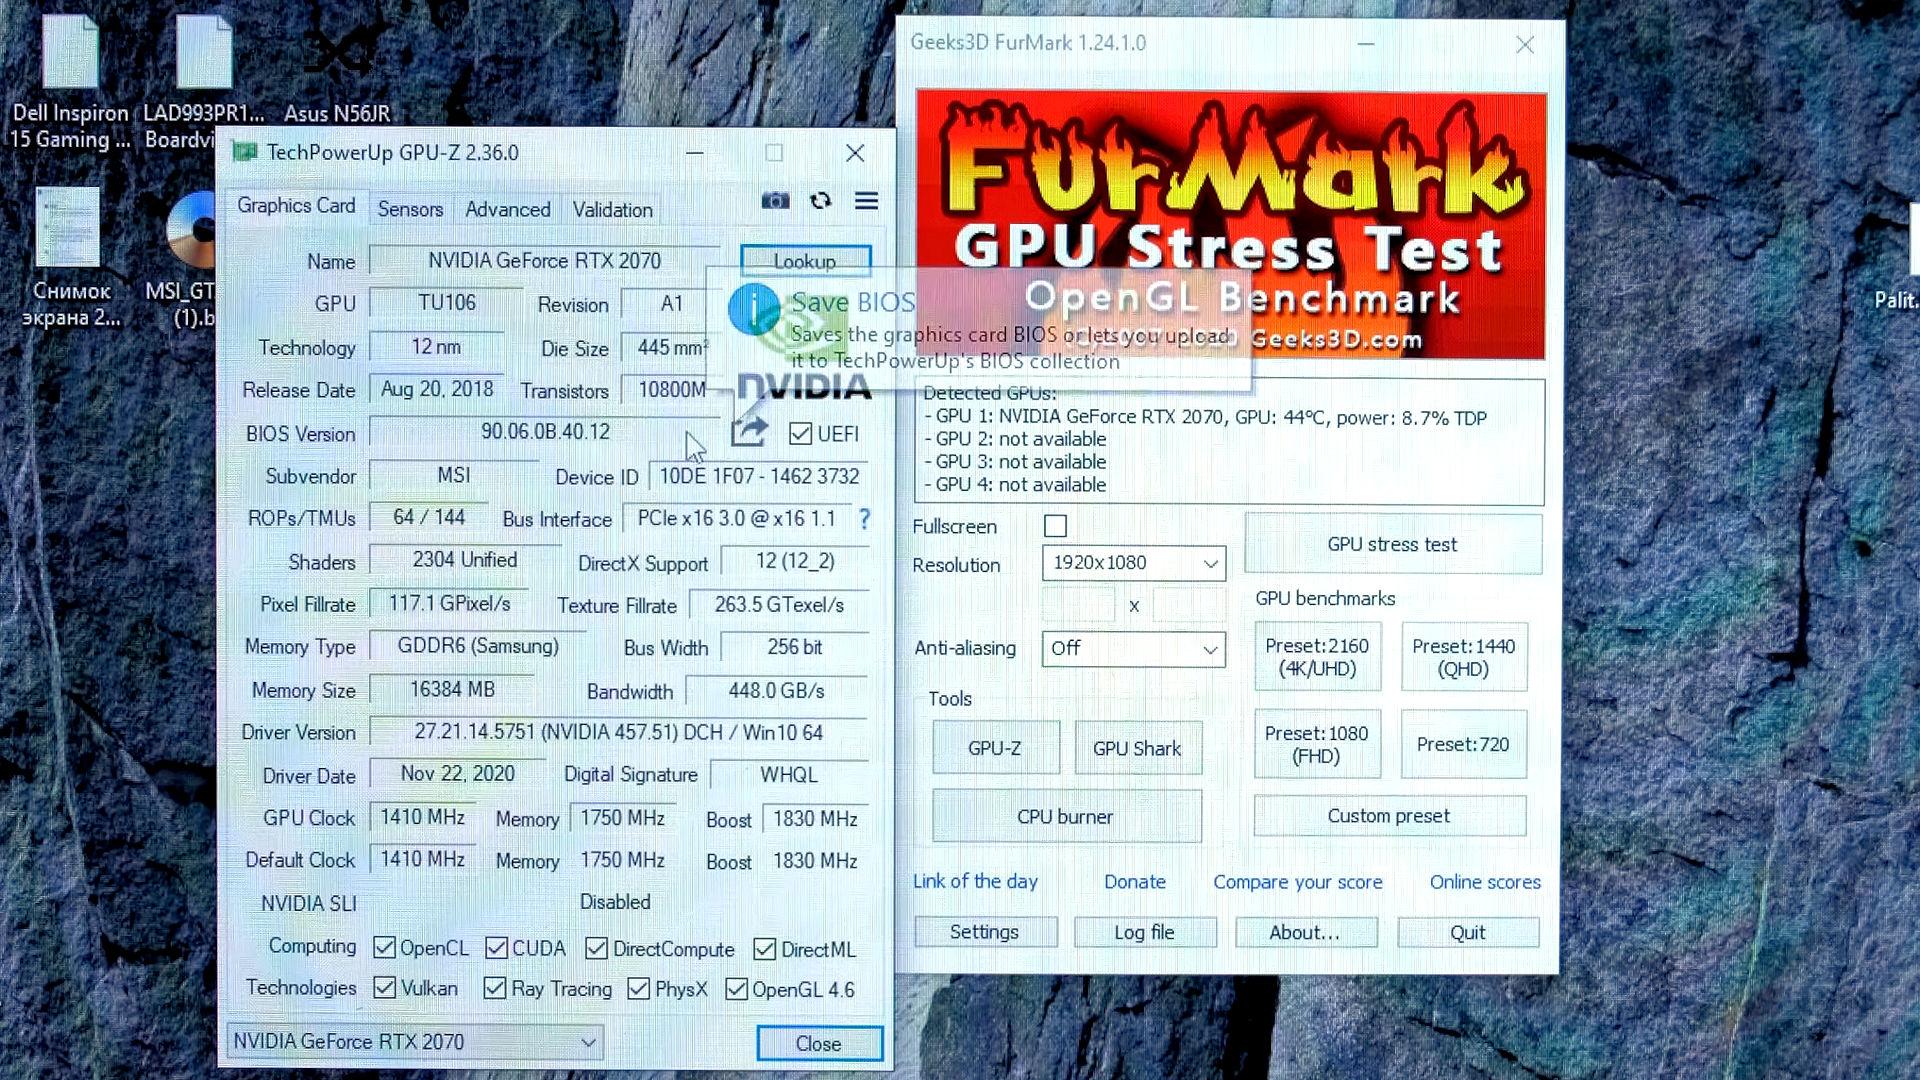 NVIDIA-RTX-2070-16GB-5.jpg